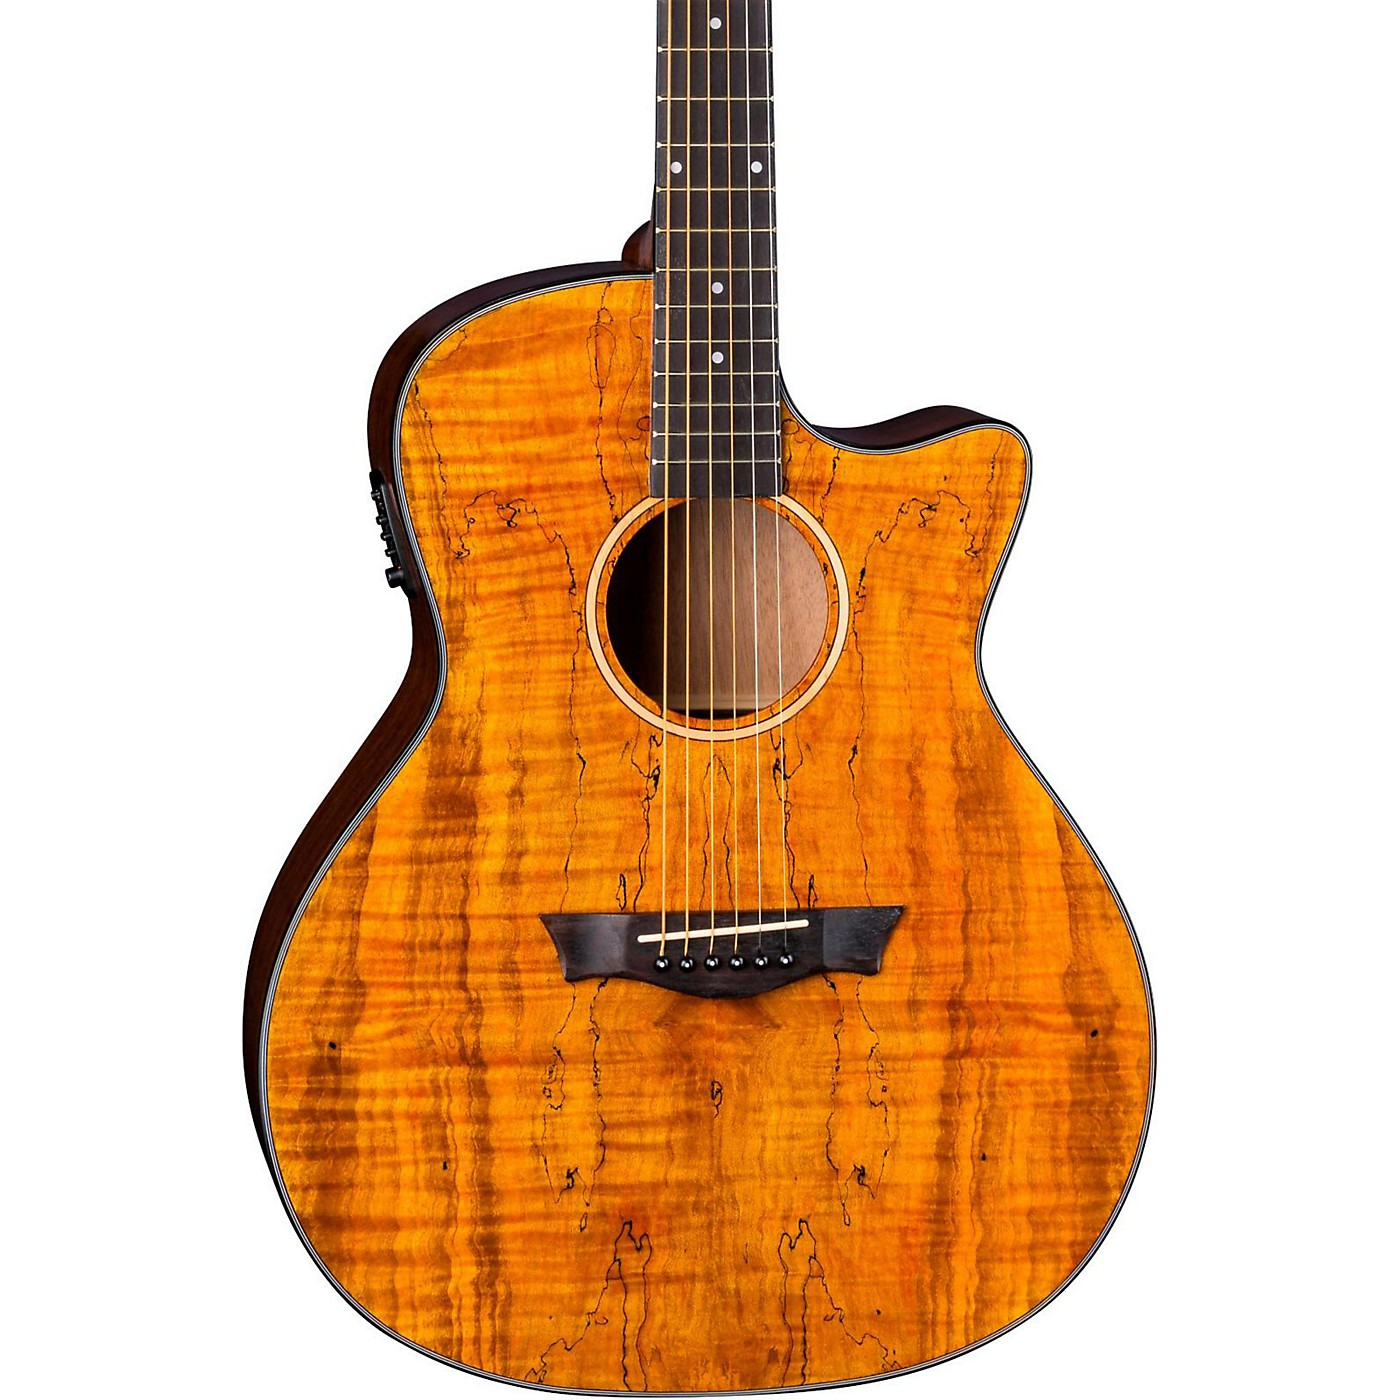 Dean Axs Exotic Gloss Spalt Maple Cutaway Acoustic-Electric Guitar thumbnail